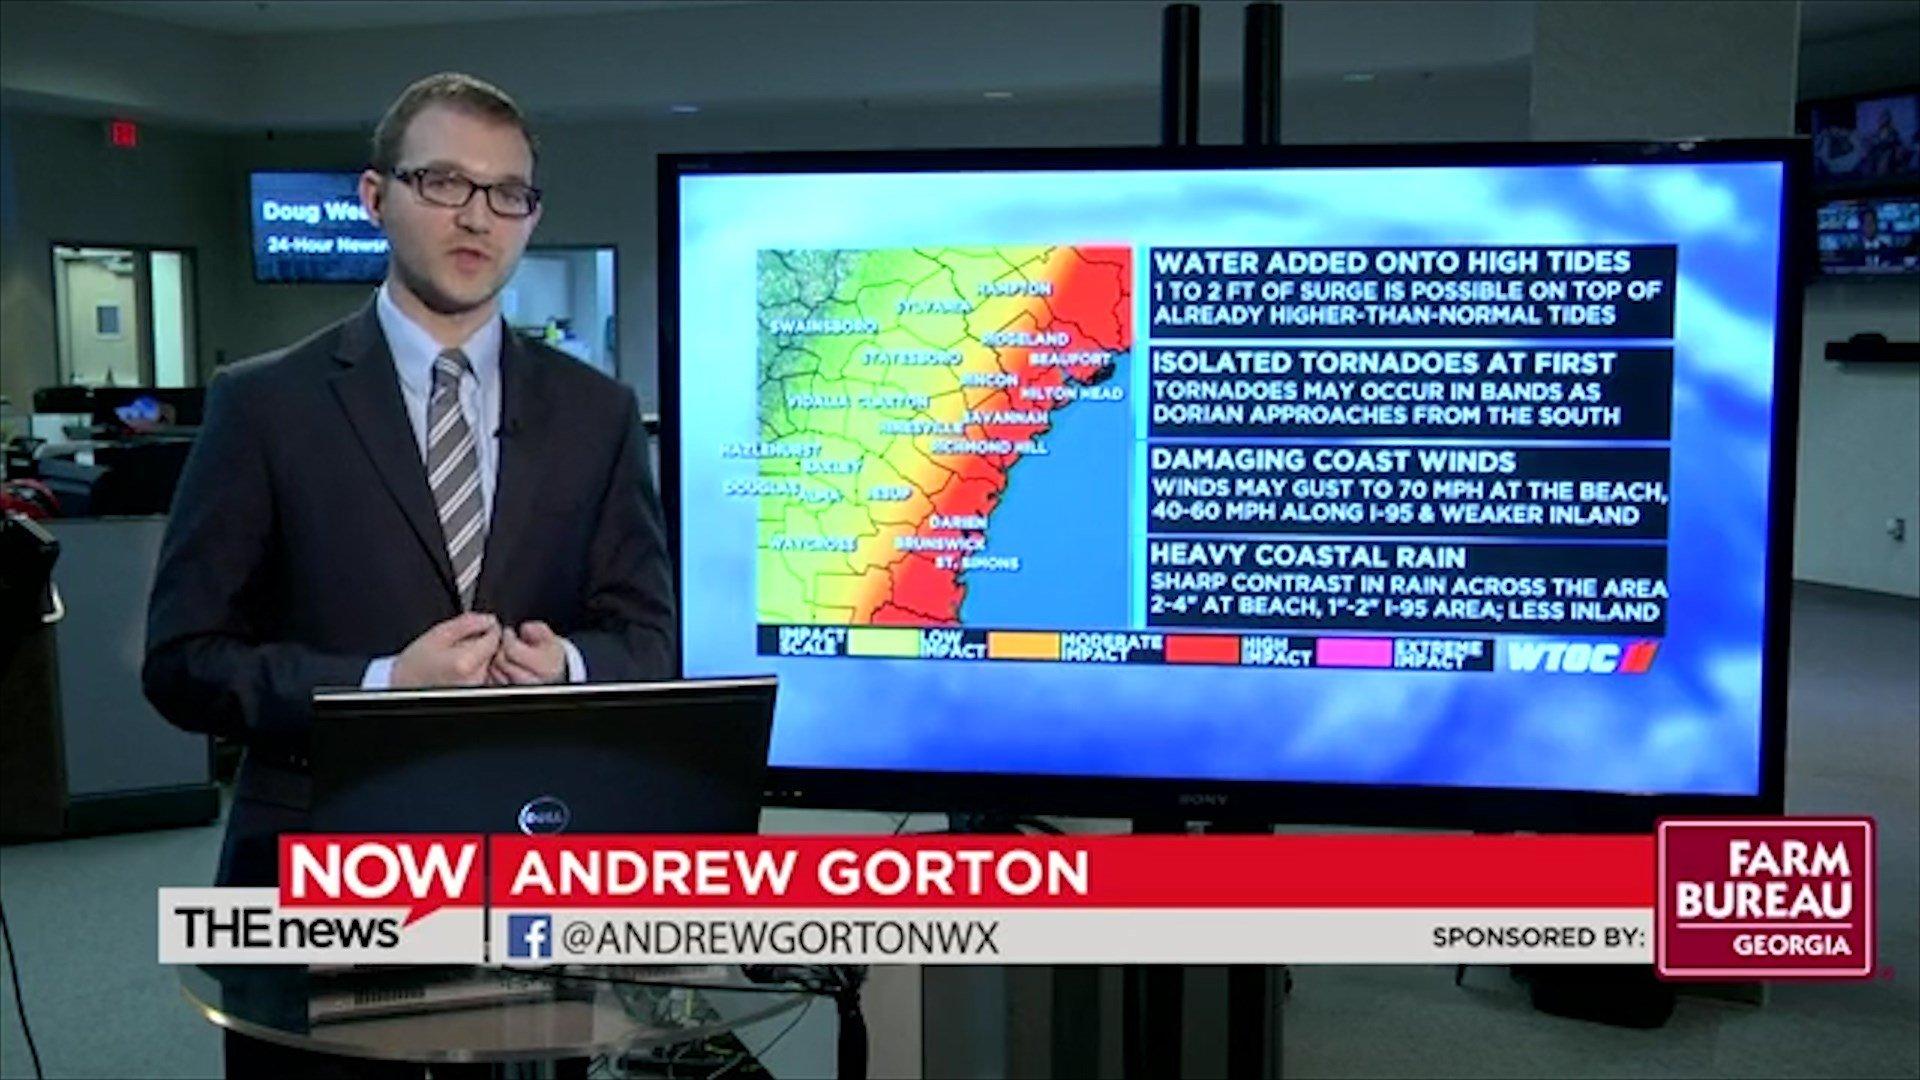 WTOC in Savannah Georgia Prepares for Hurricane Coverage